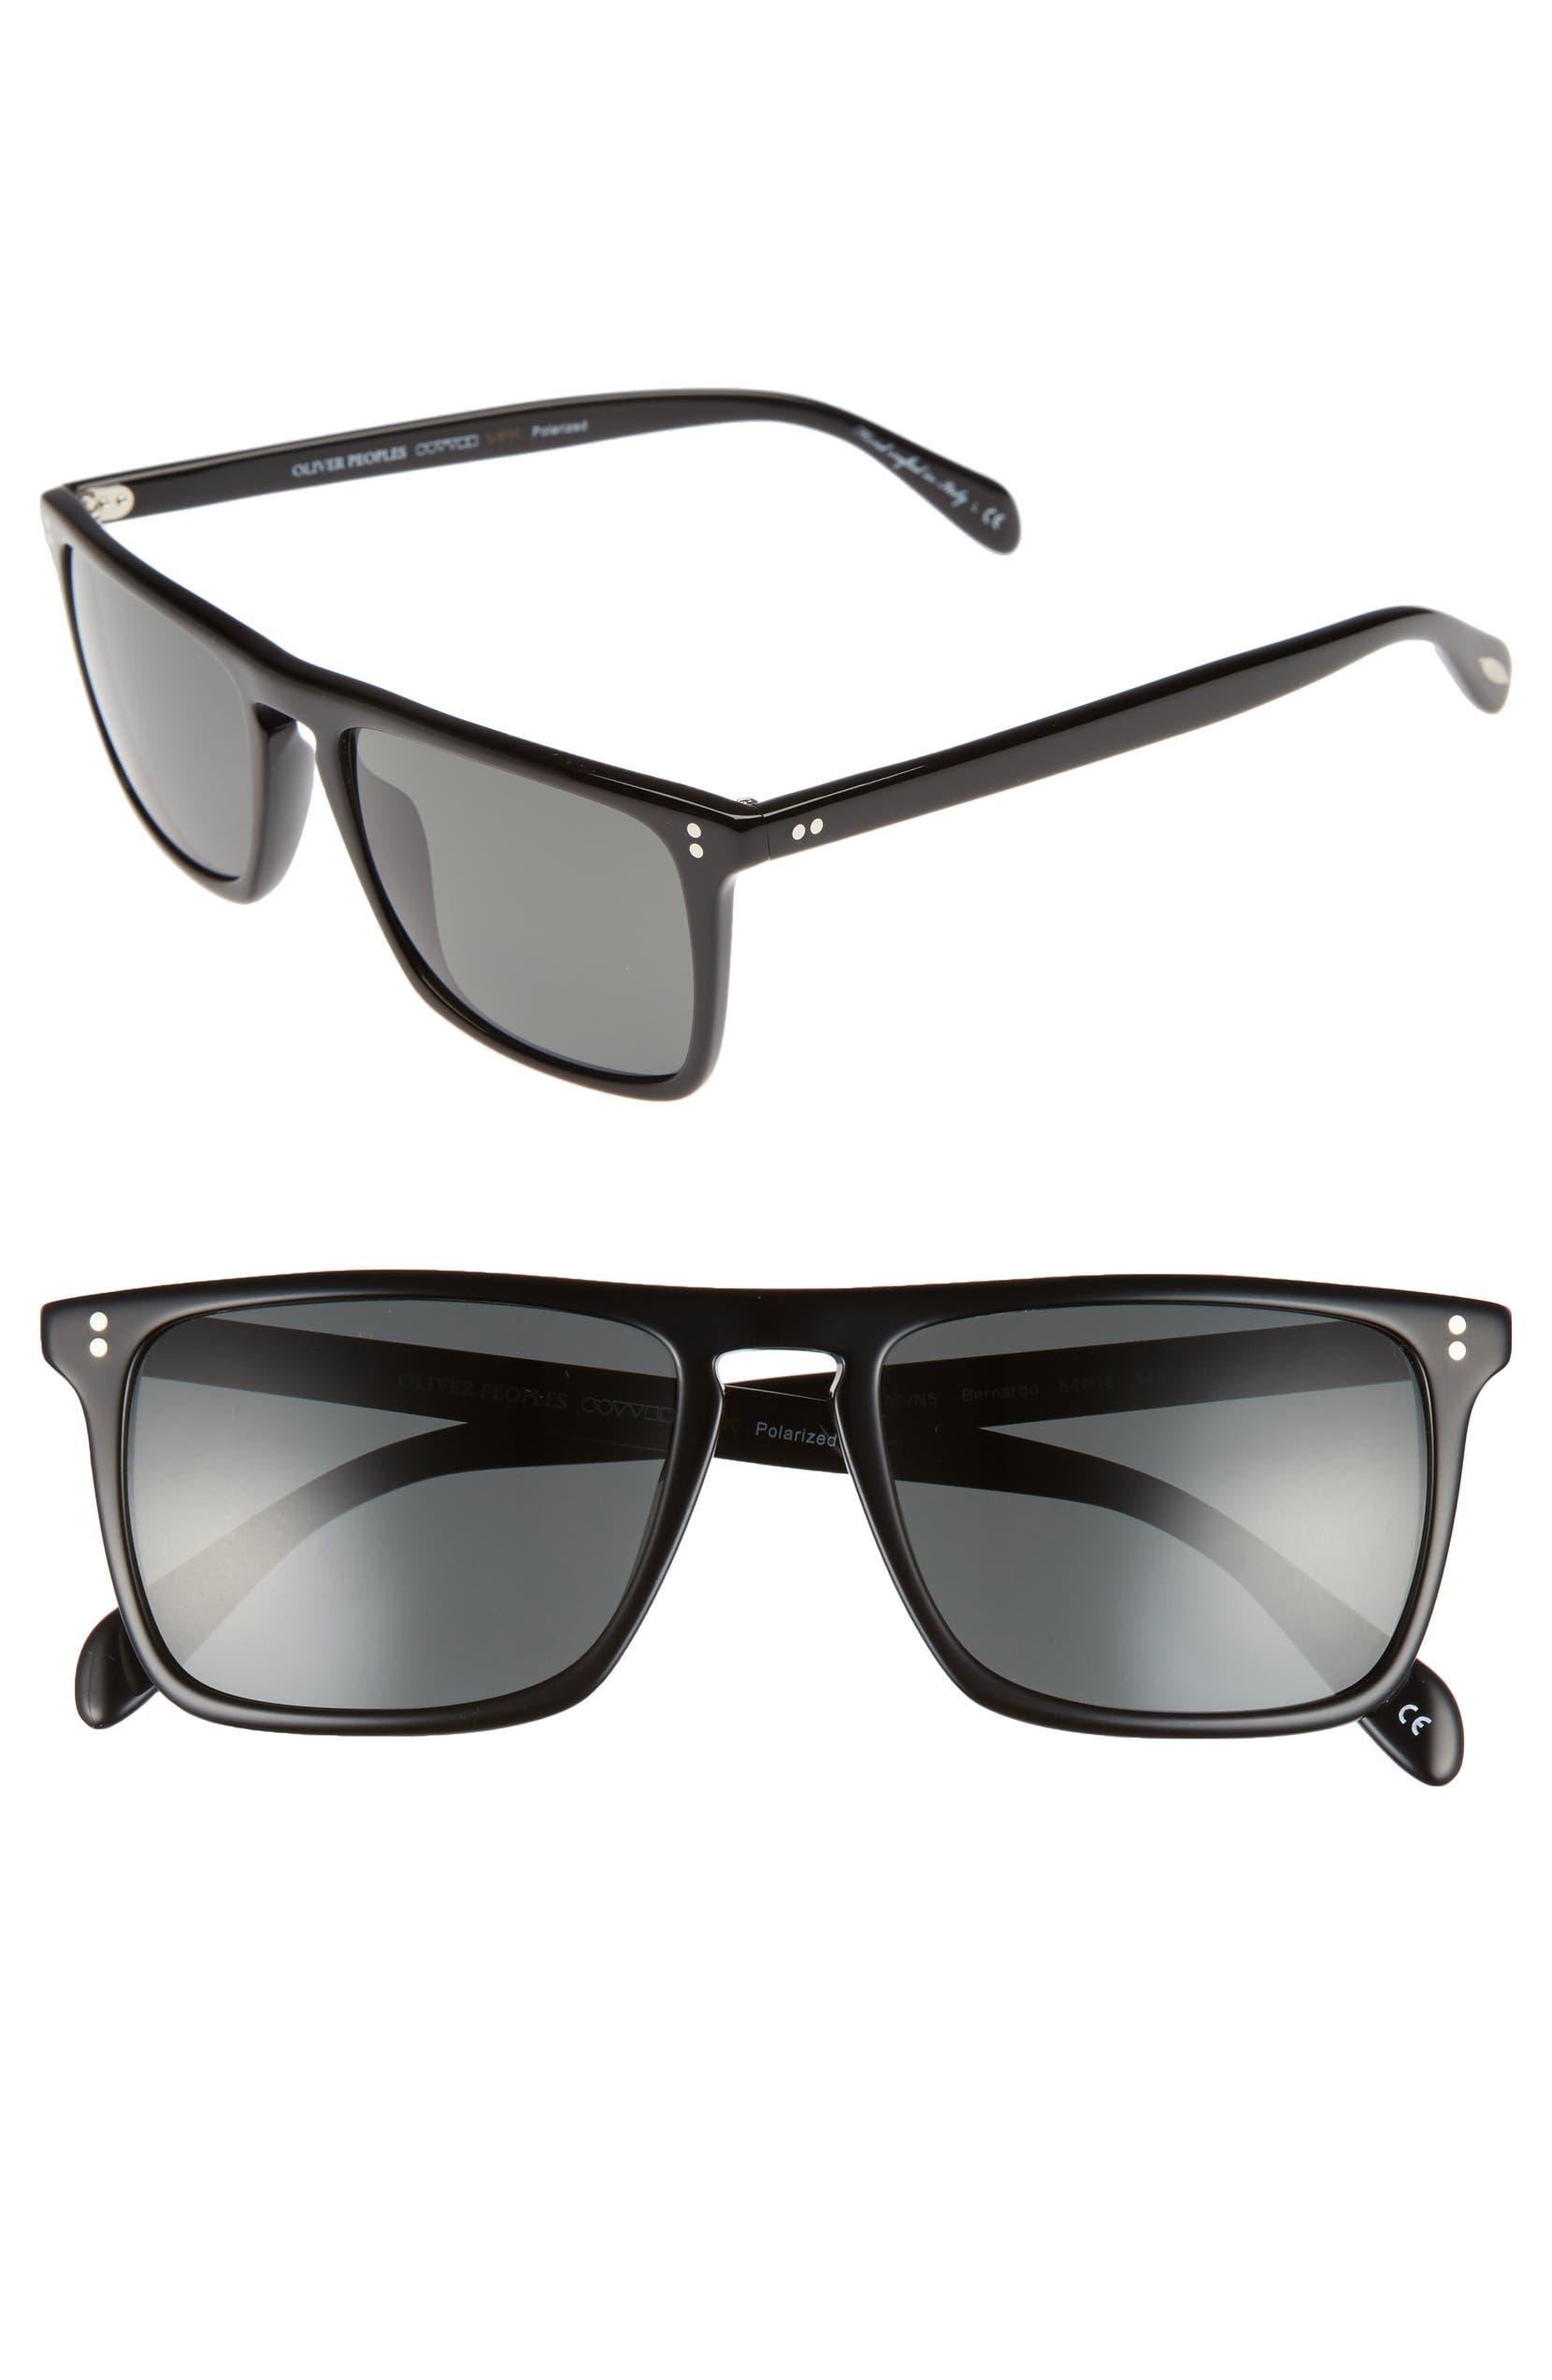 740ffb88ca6 Oliver Peoples Bernardo 54mm Polarized Sunglasses